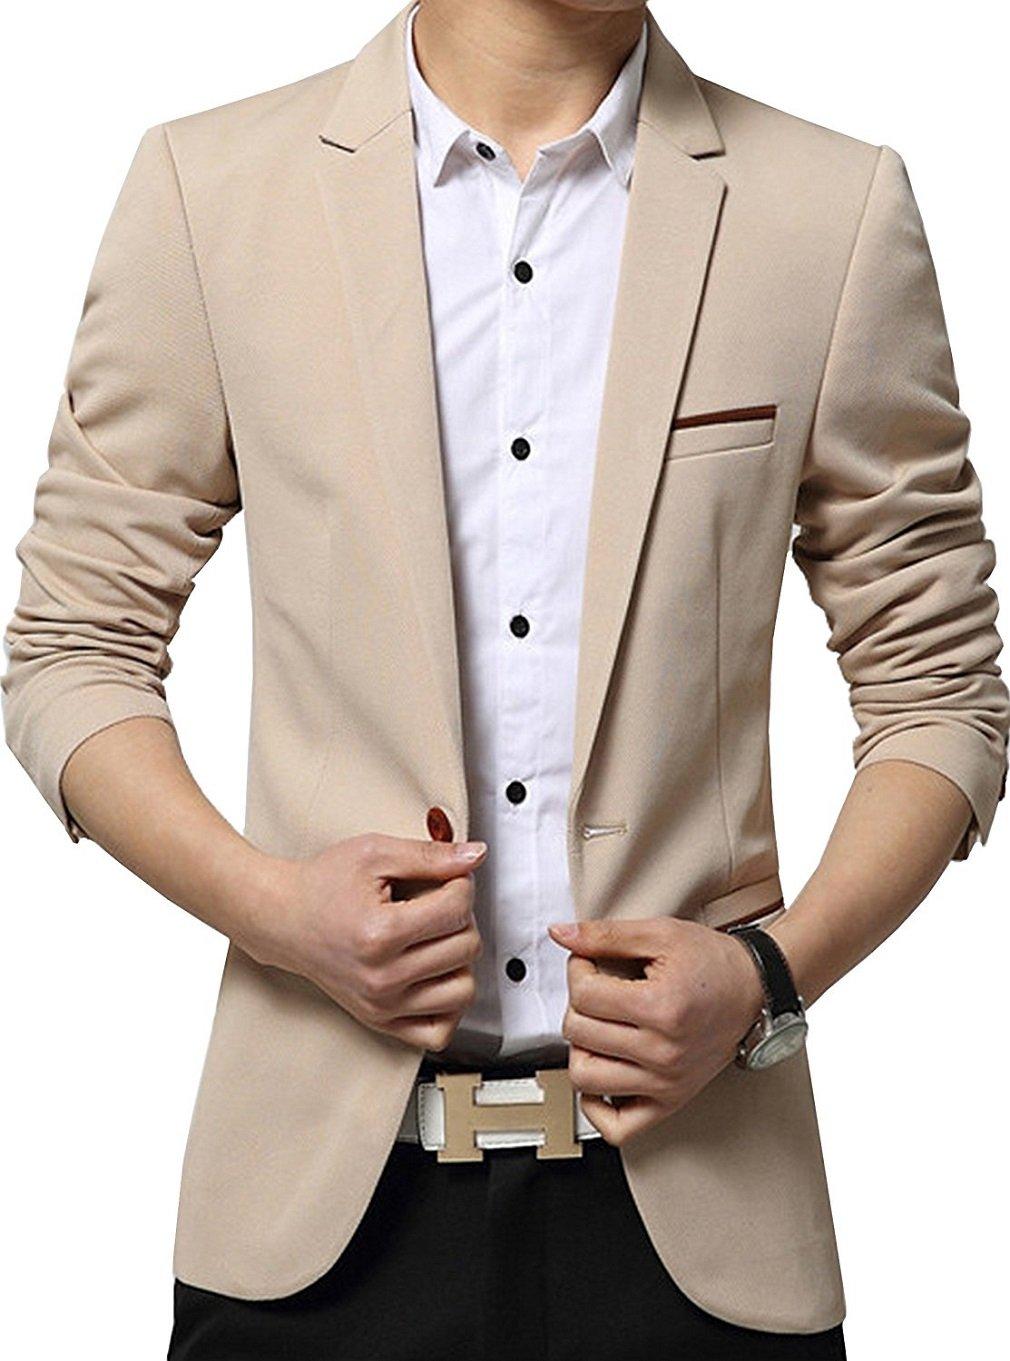 YIMANIE Mens Blazer Jacket Slim Fit Casual Single One Button Premium Lightweight Blazer Coat Khaki Large